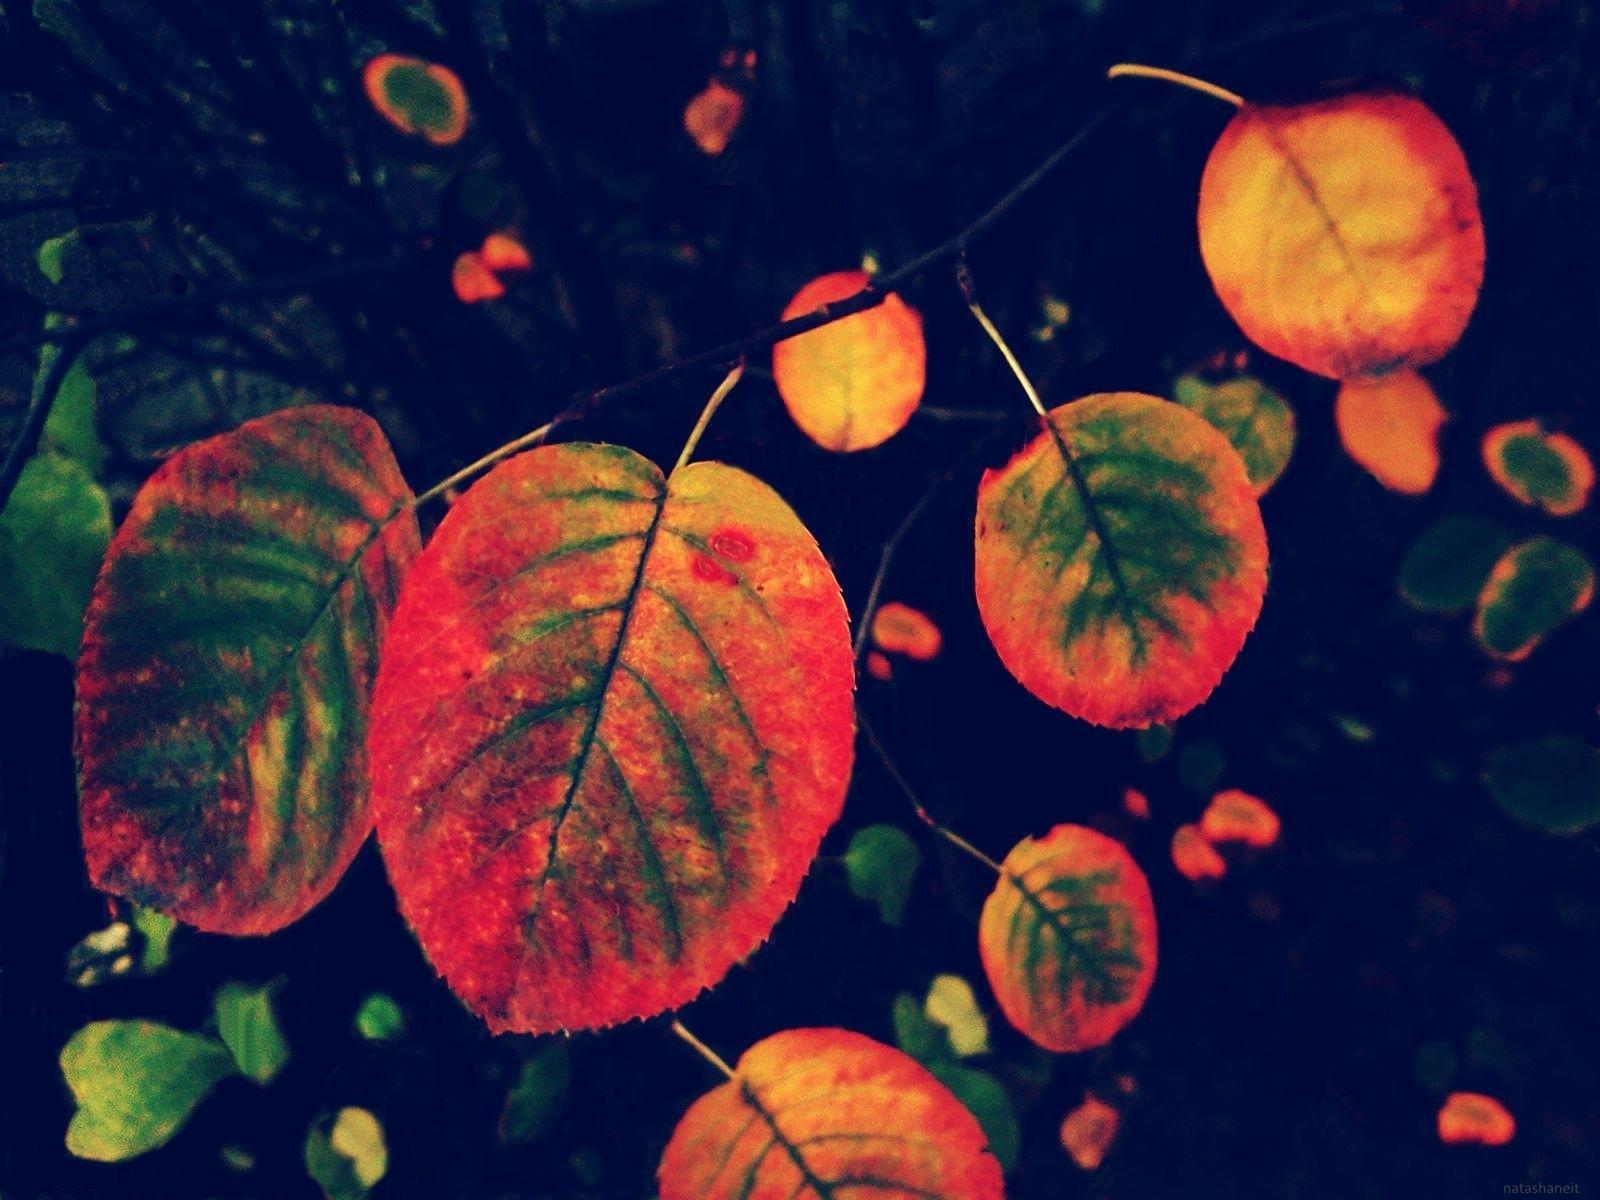 Autumn colors by natashaneit